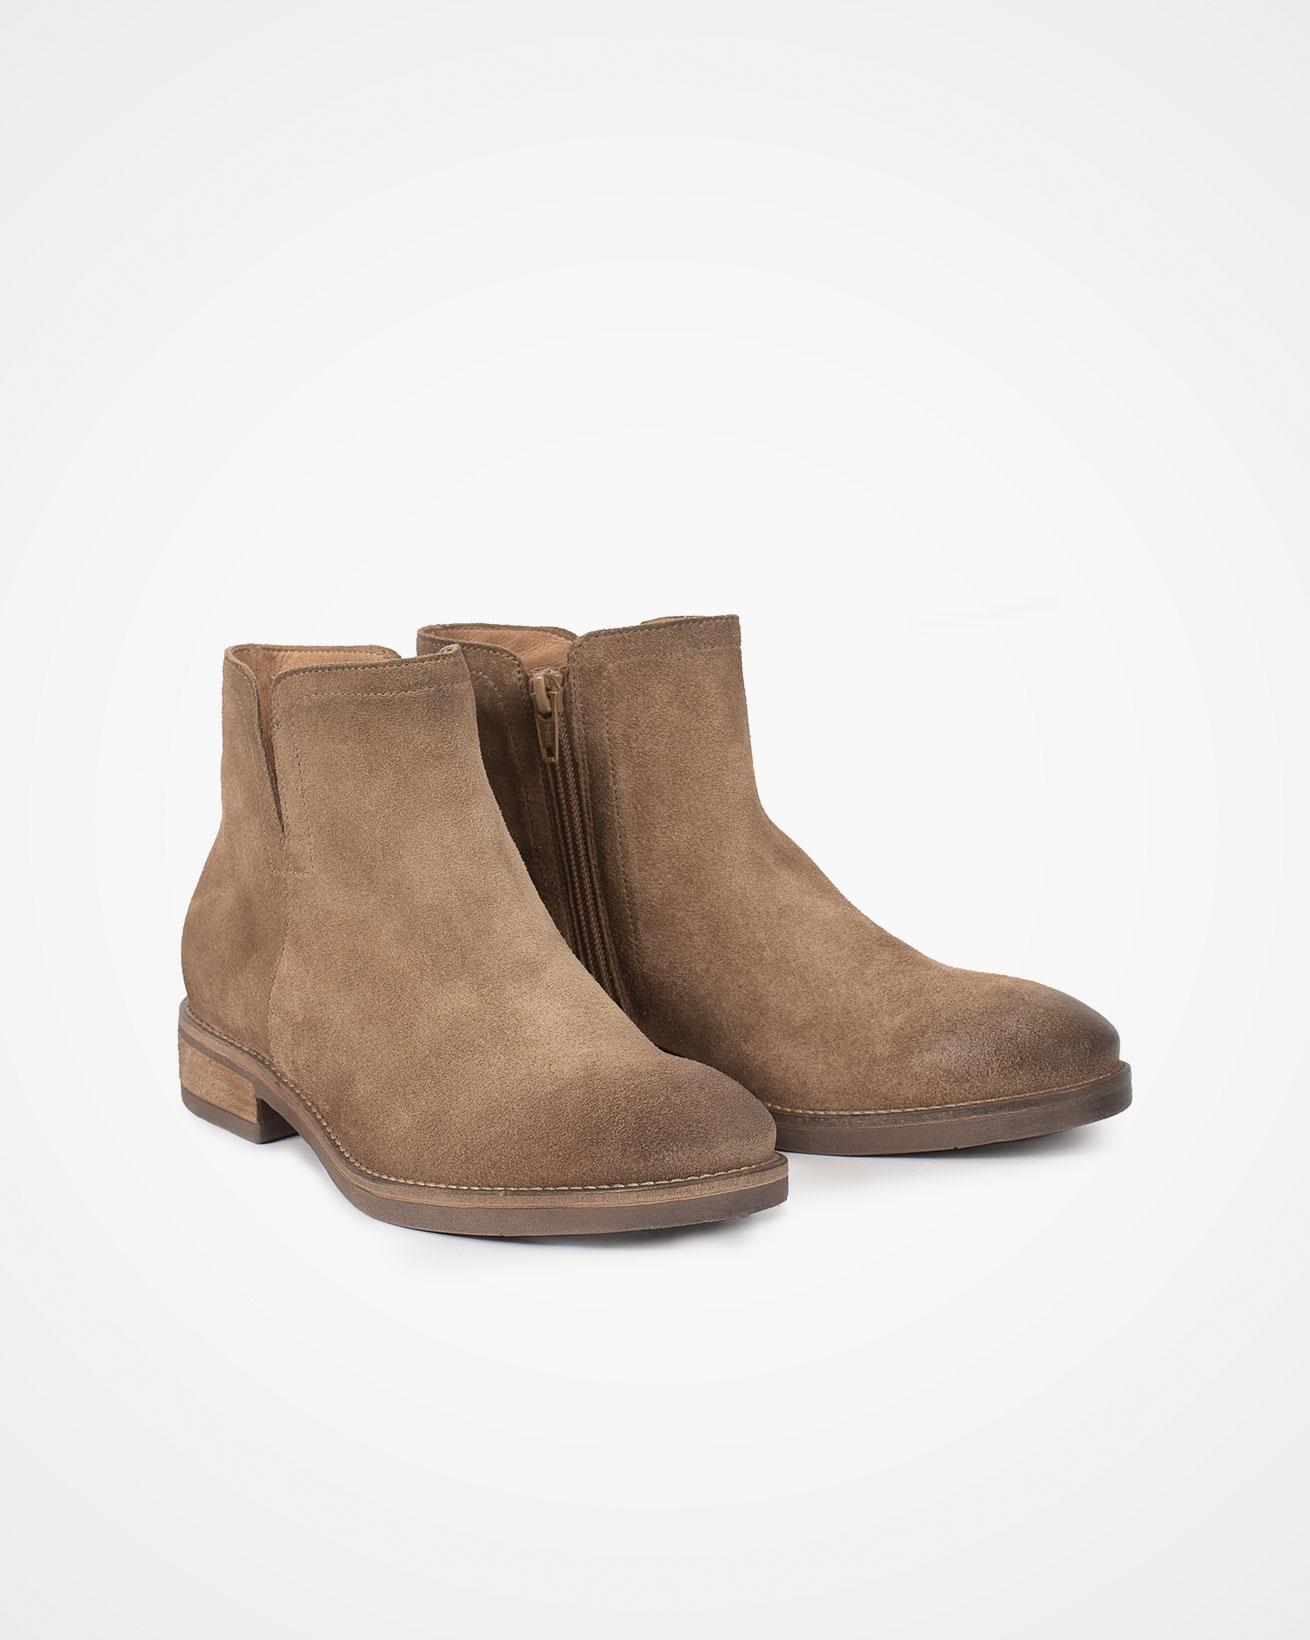 7792_split-side-ankle-boots_camel_pair.jpg